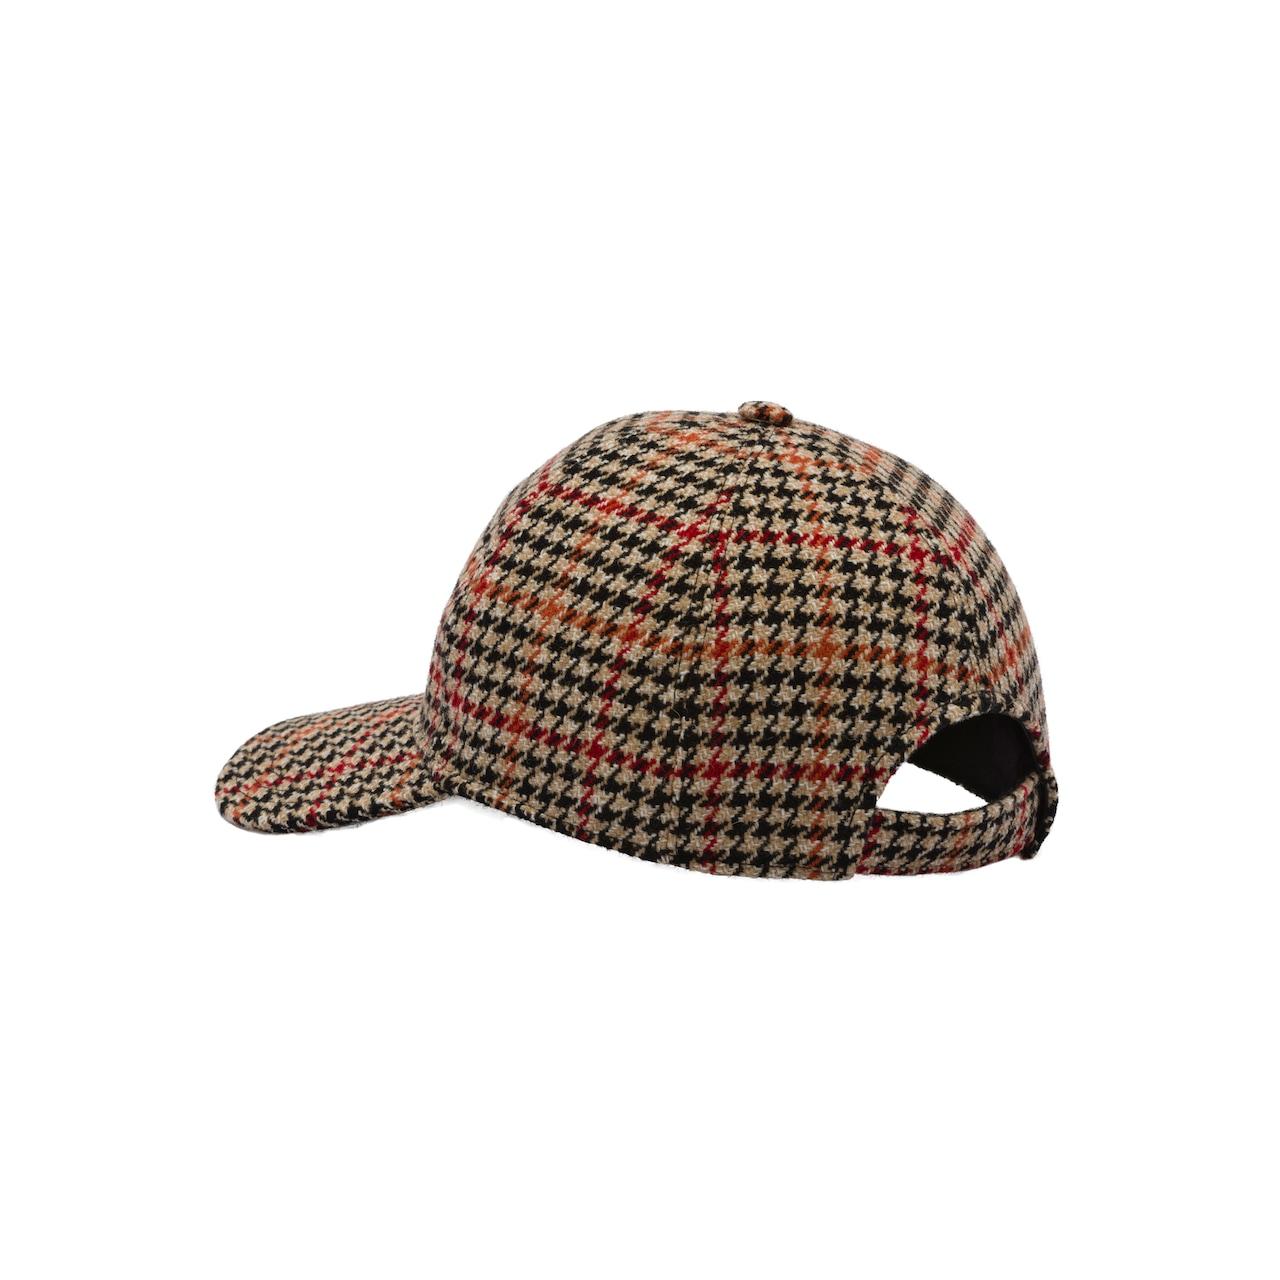 Houndstooth wool cap